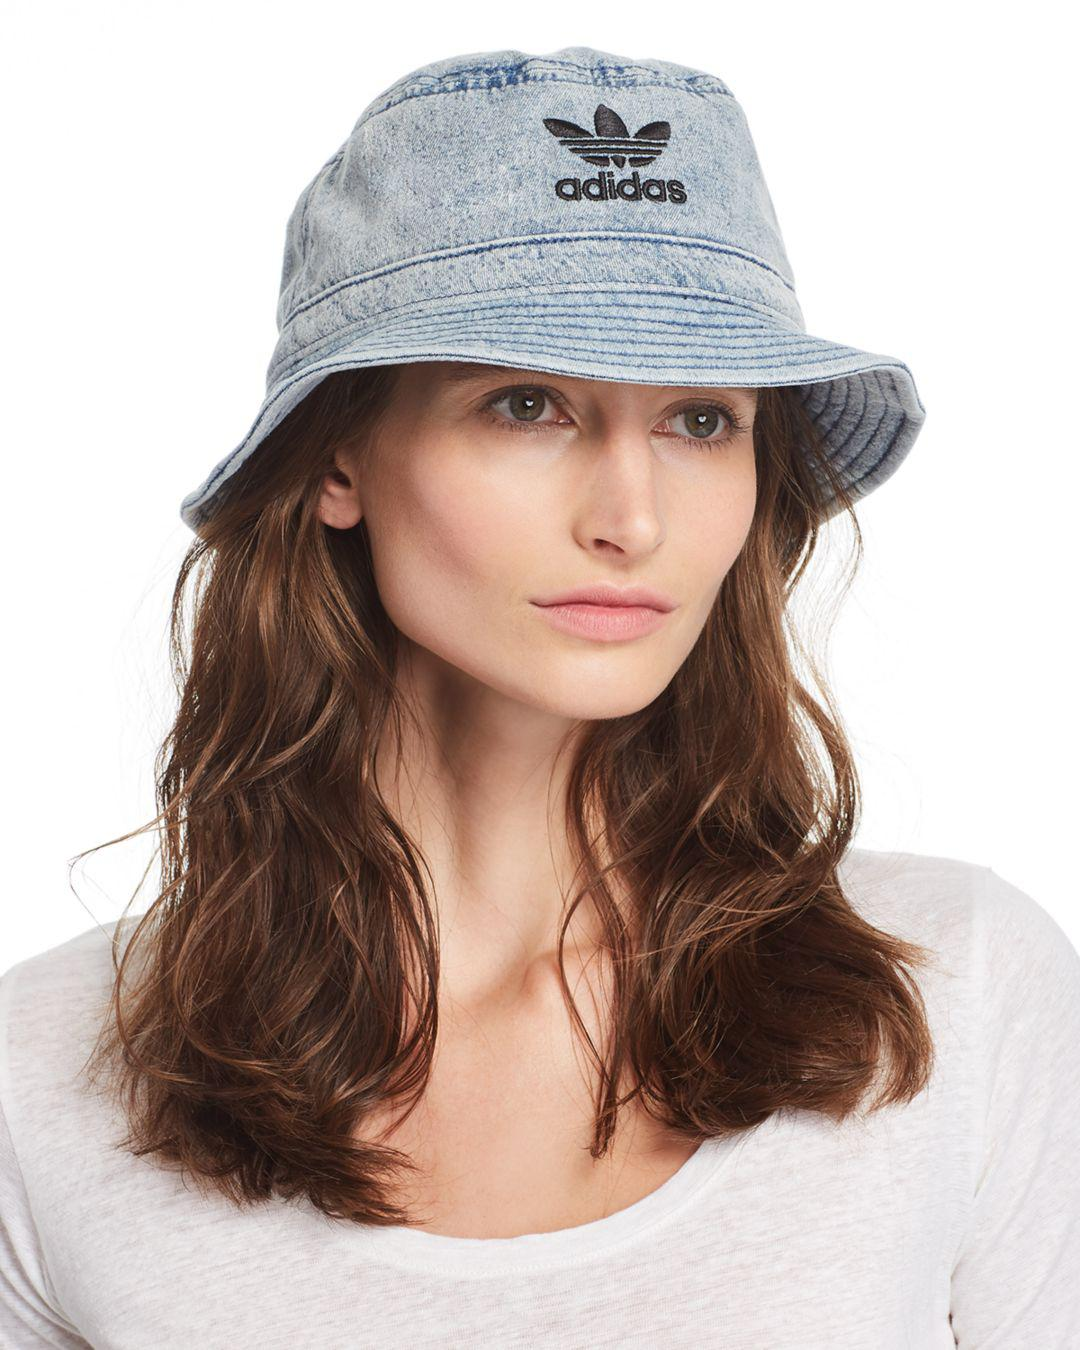 d817d871 adidas Originals Unisex Denim Bucket Hat in Blue - Lyst